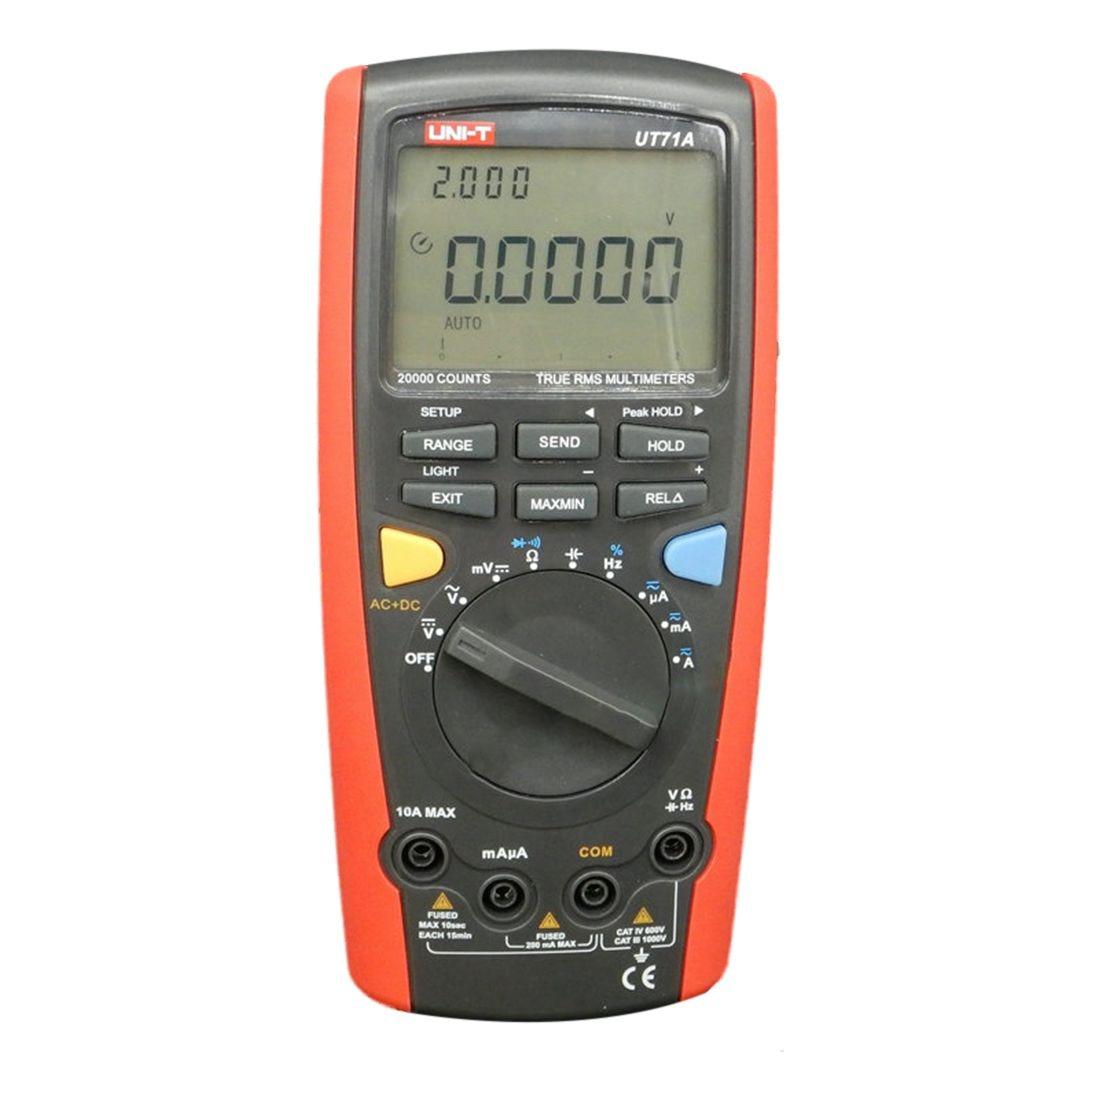 UNI-T1 set UT71A Intelligent Digital Multimeters CD Digital AC DC current voltage USB true Resistance Tester Ammeter Multitester мультиметр uni t uni t ut71b alicate amperimetro ac dc